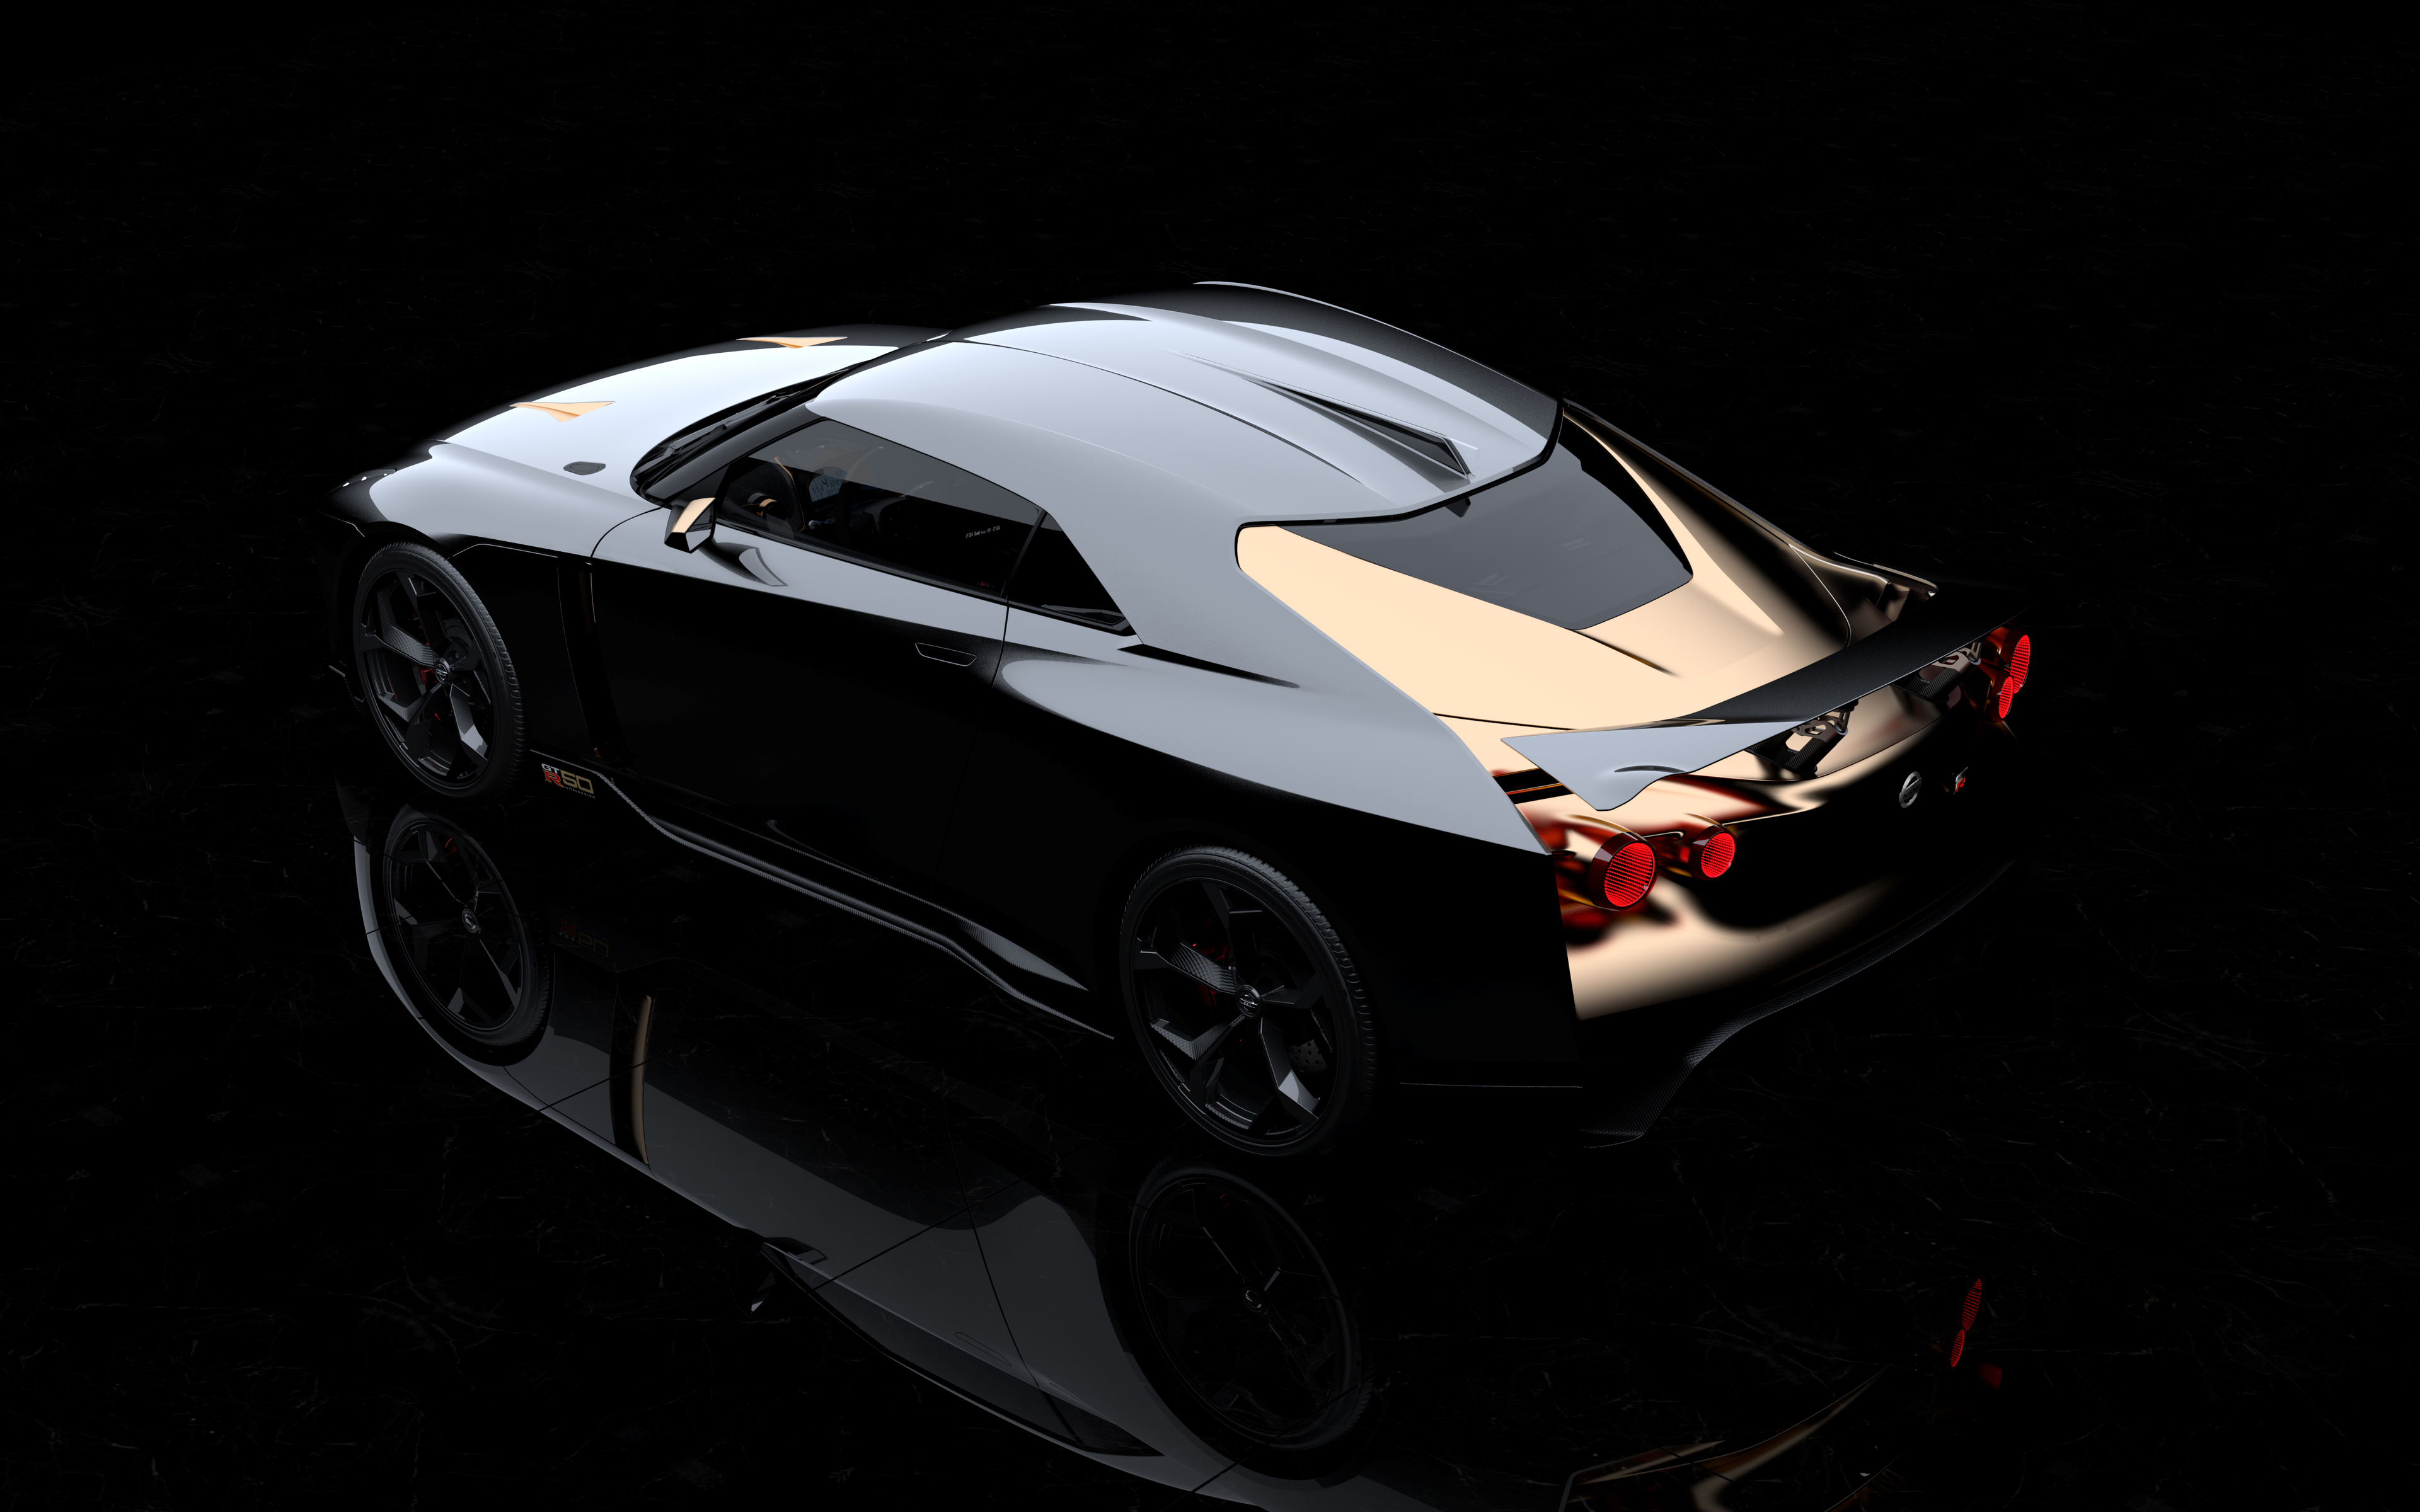 nissan-gt-r50-concept-2018-ultra-limited-rear-na.jpg